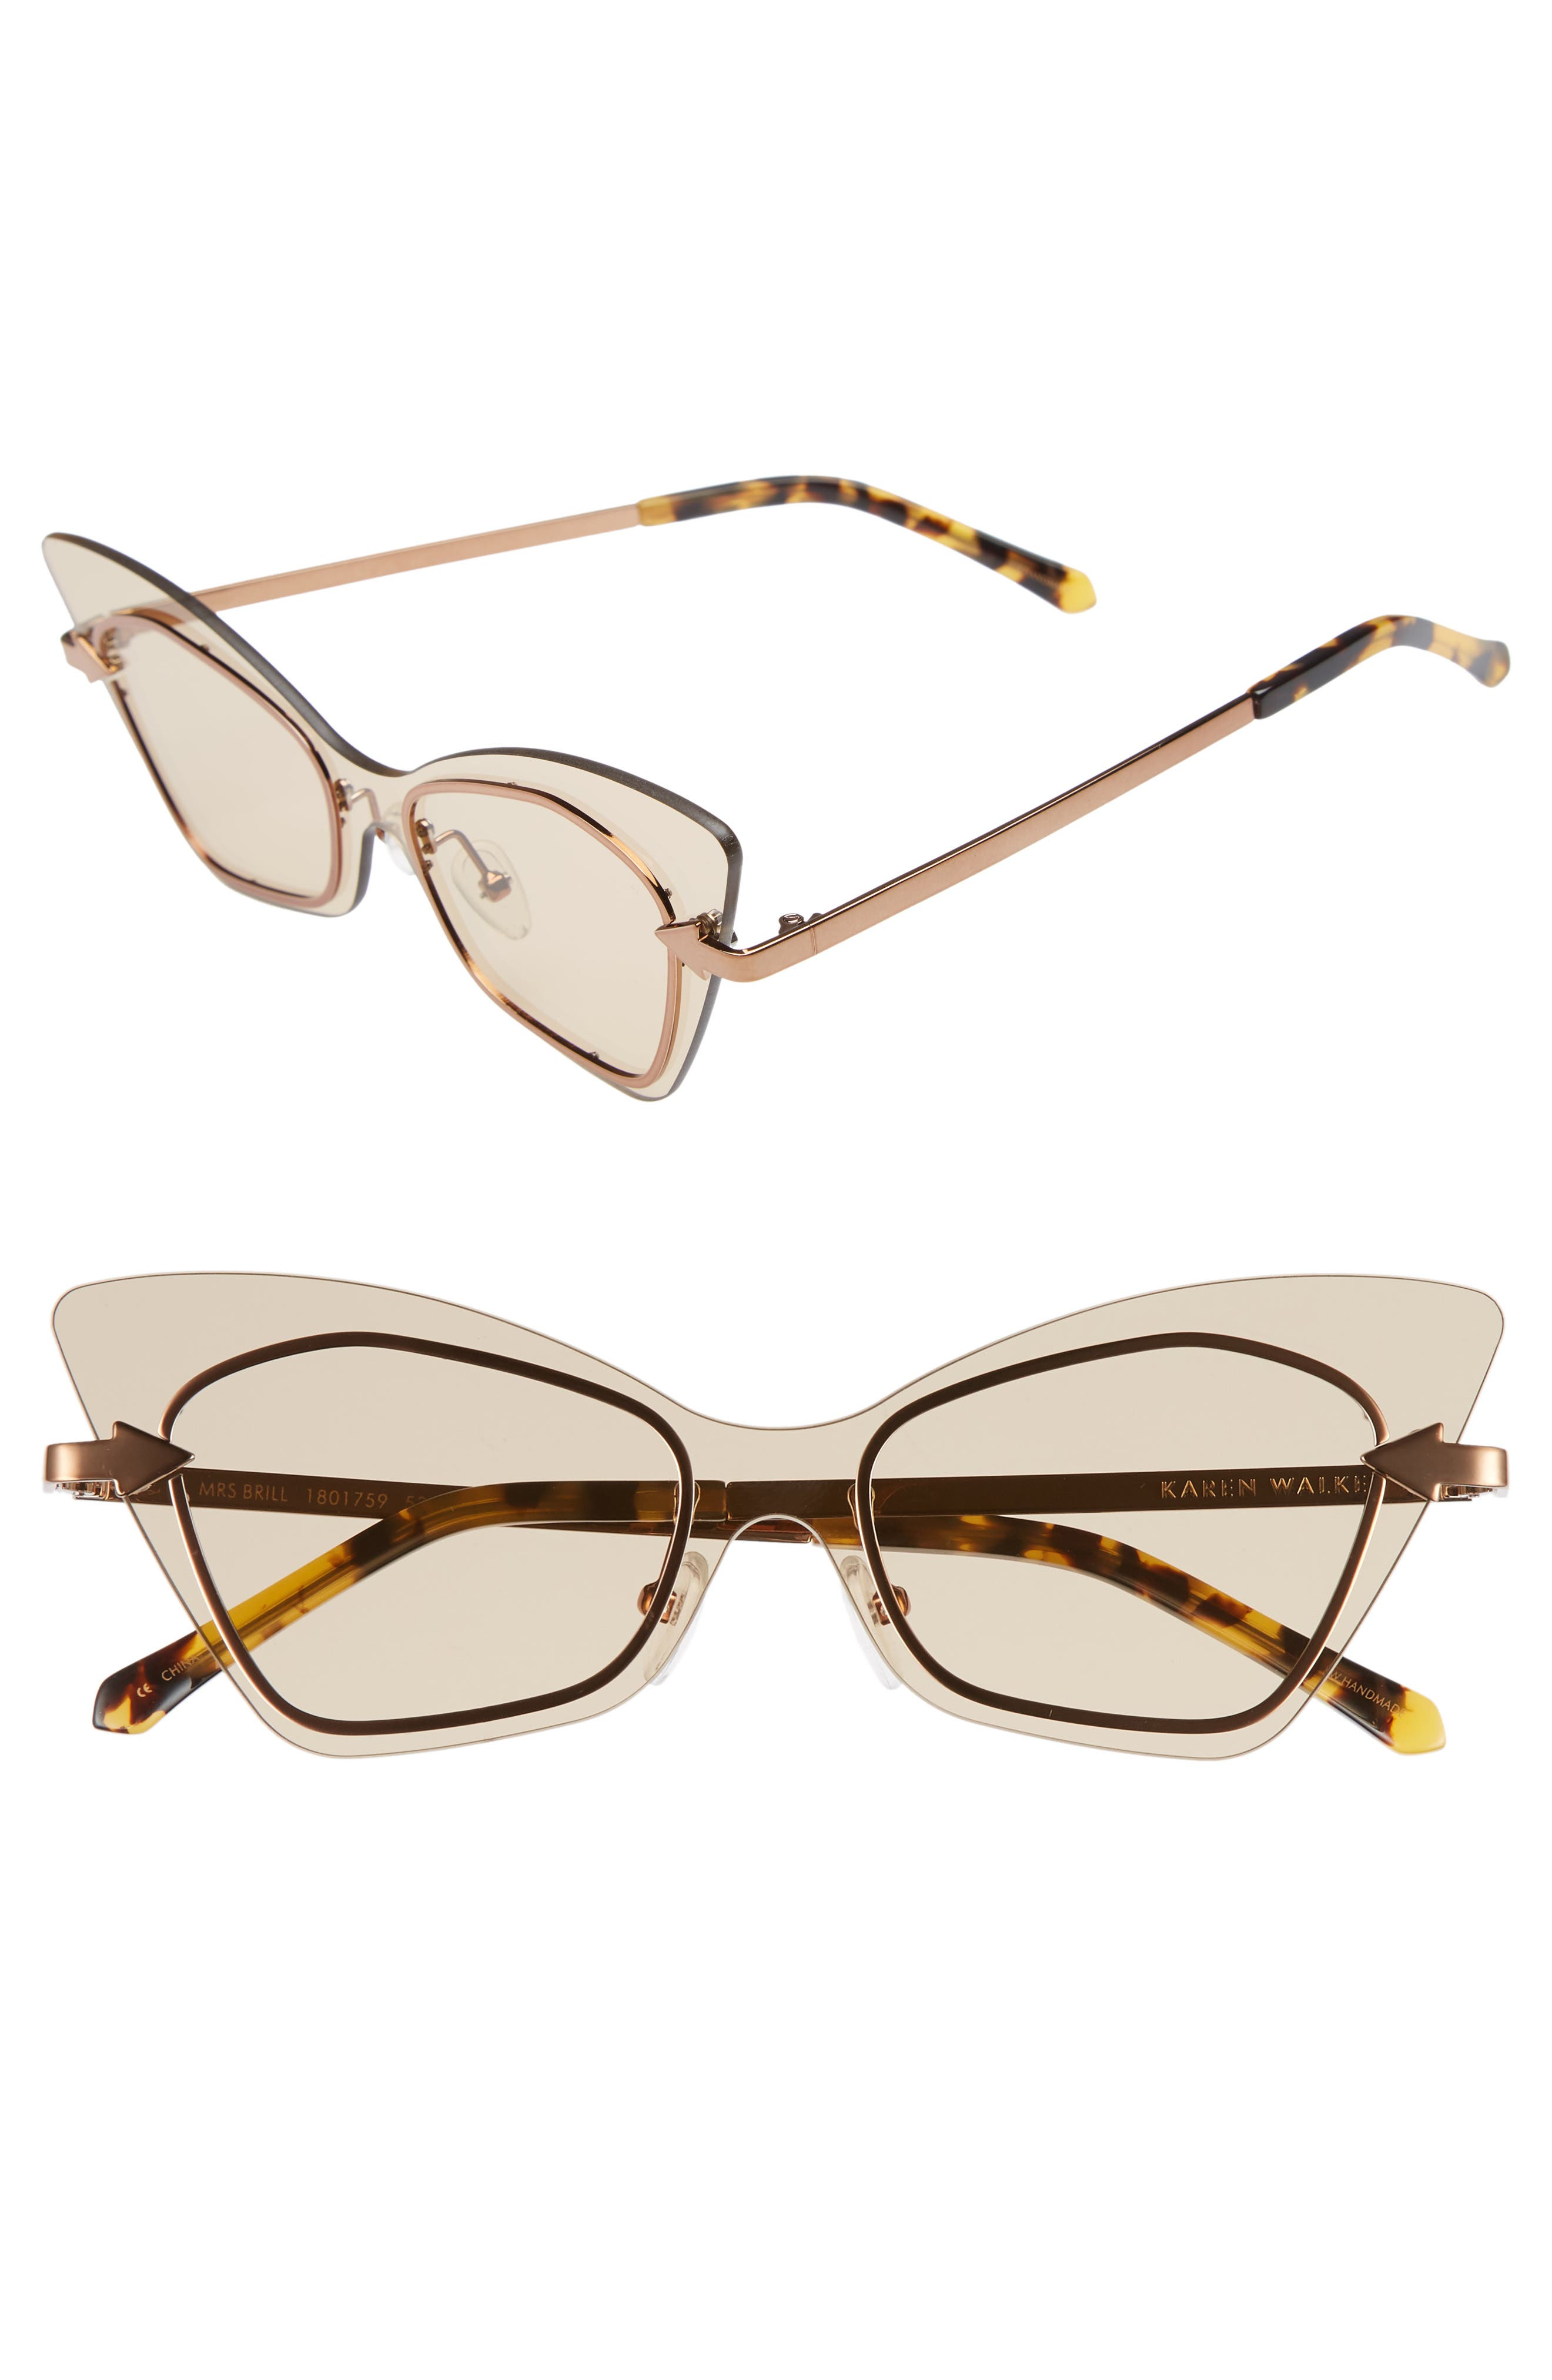 Mrs. Brill 53mm Cat Eye Sunglasses,                             Main thumbnail 1, color,                             Crazy Tortoise